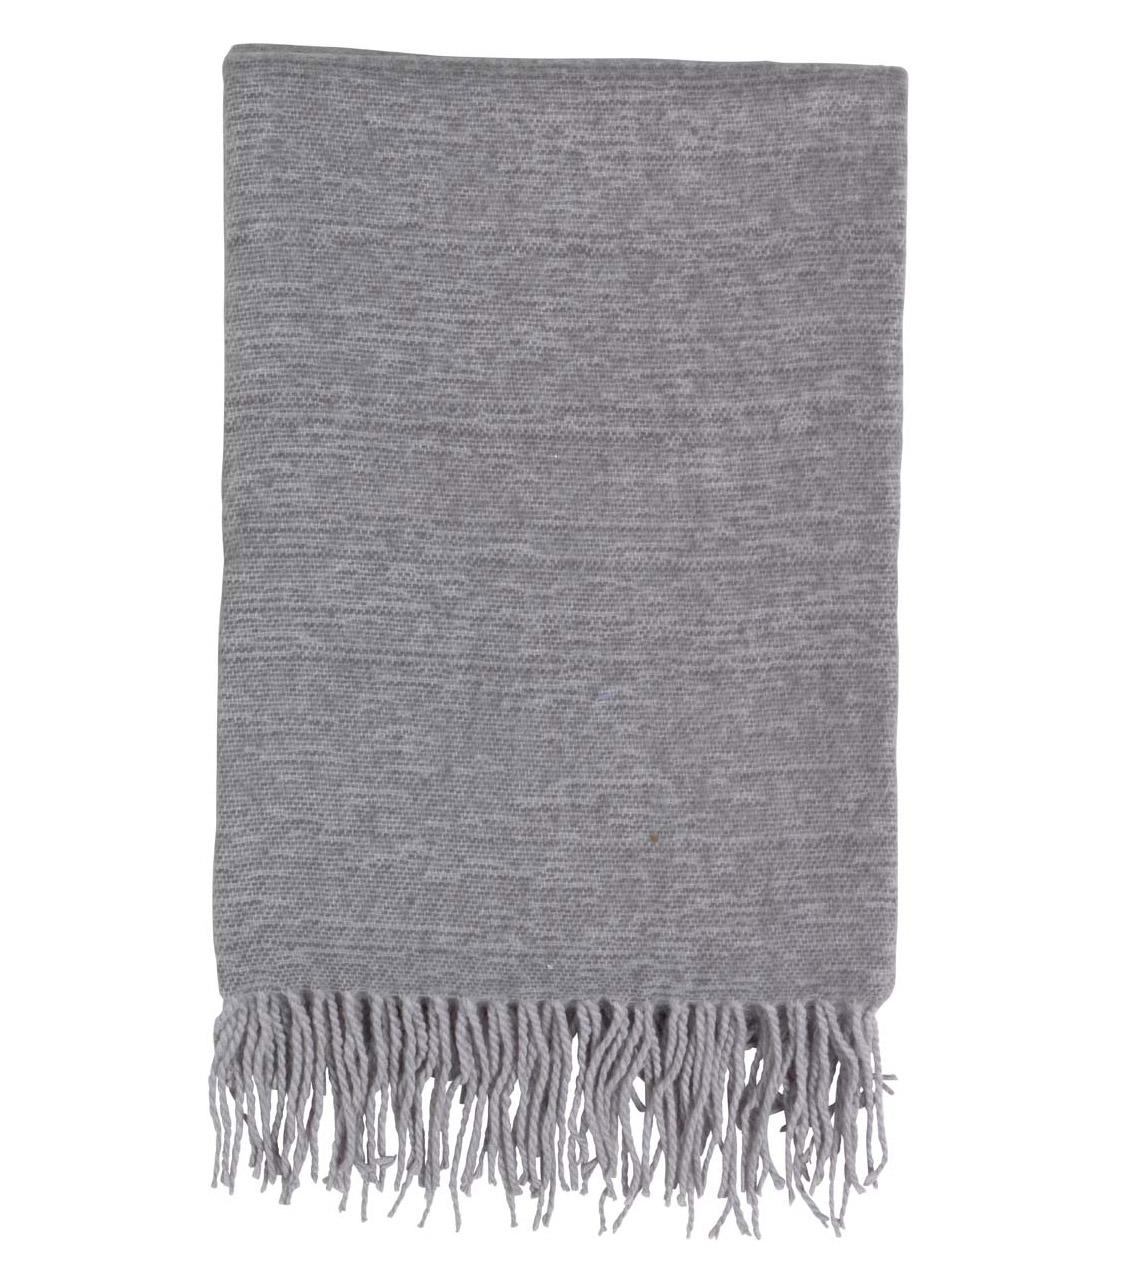 FONS - Plaid grijs 130x180 cm